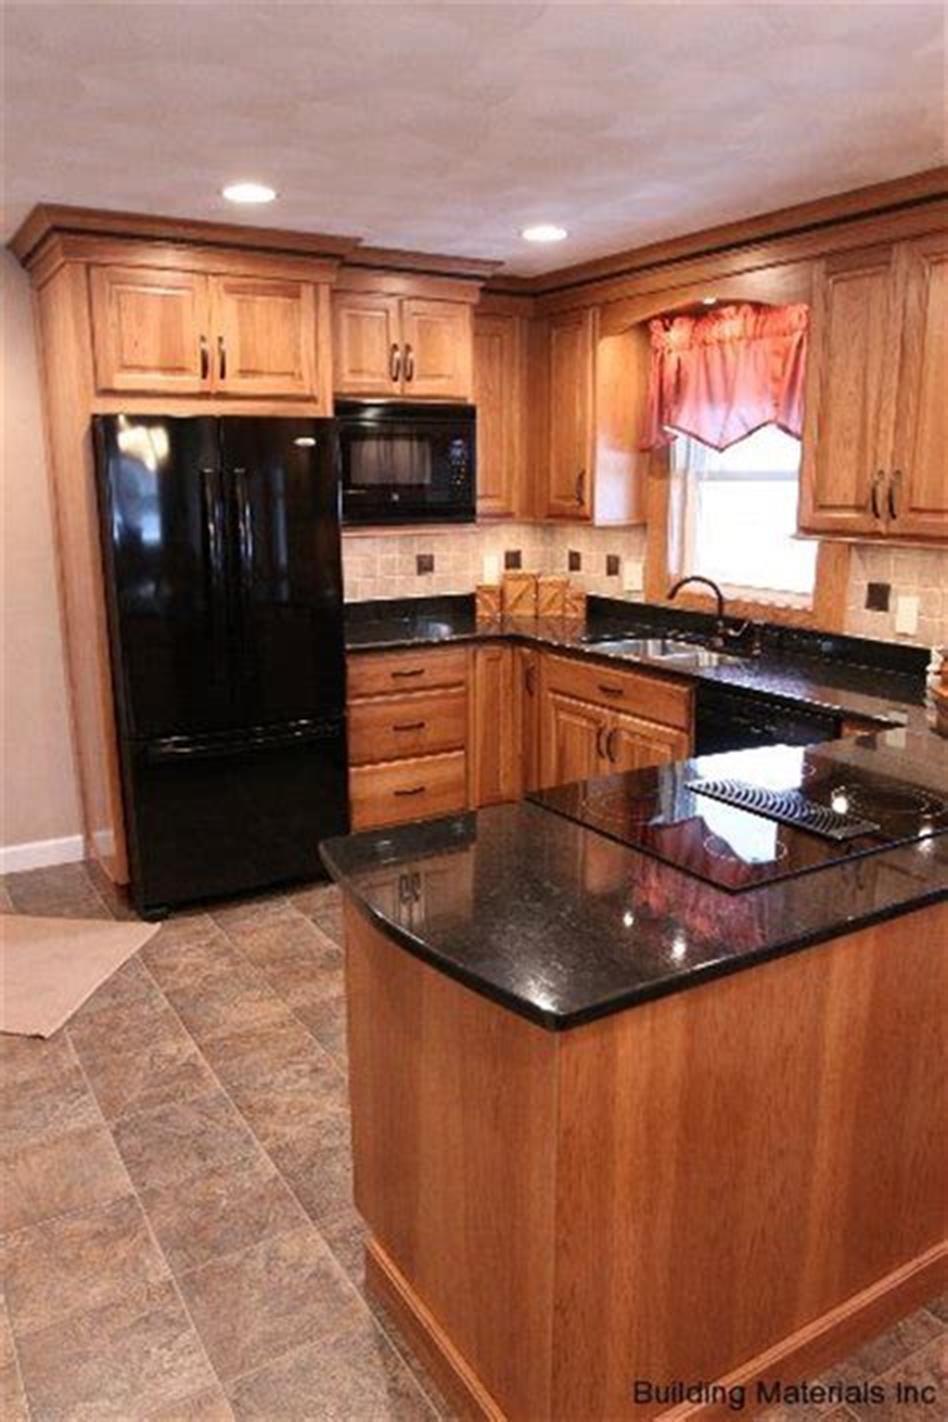 30 Affordable Kitchens With Oak Cabinets Ideas Comedecor Black Appliances Kitchen Trendy Kitchen Tile Kitchen Renovation